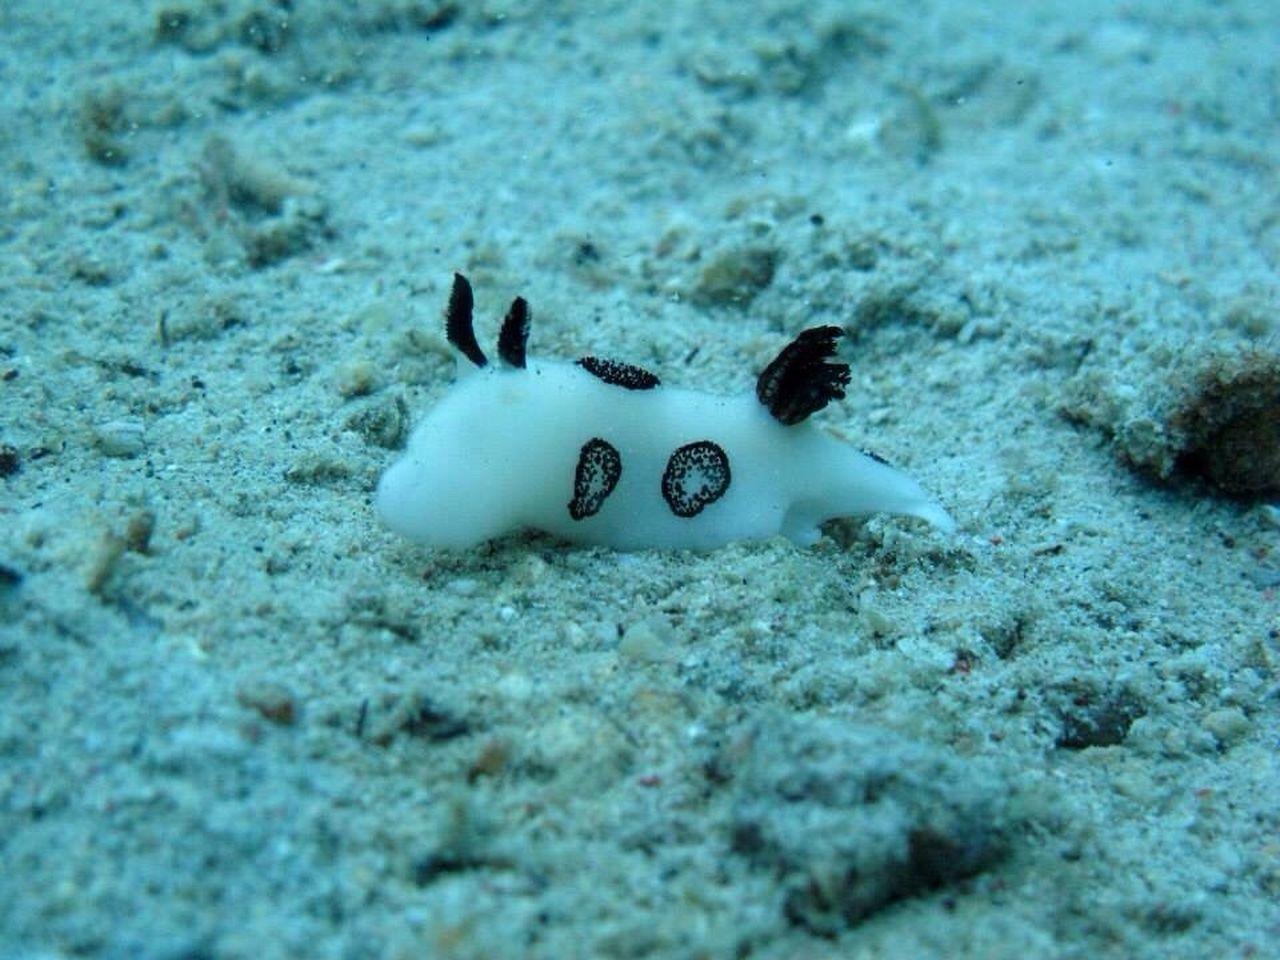 Nudi Nudibrach Diving SCUBA Underwaterworld Uwphotography Scuba Diving Scubadiving Jorunna Funebris - Black And White Nudibranch